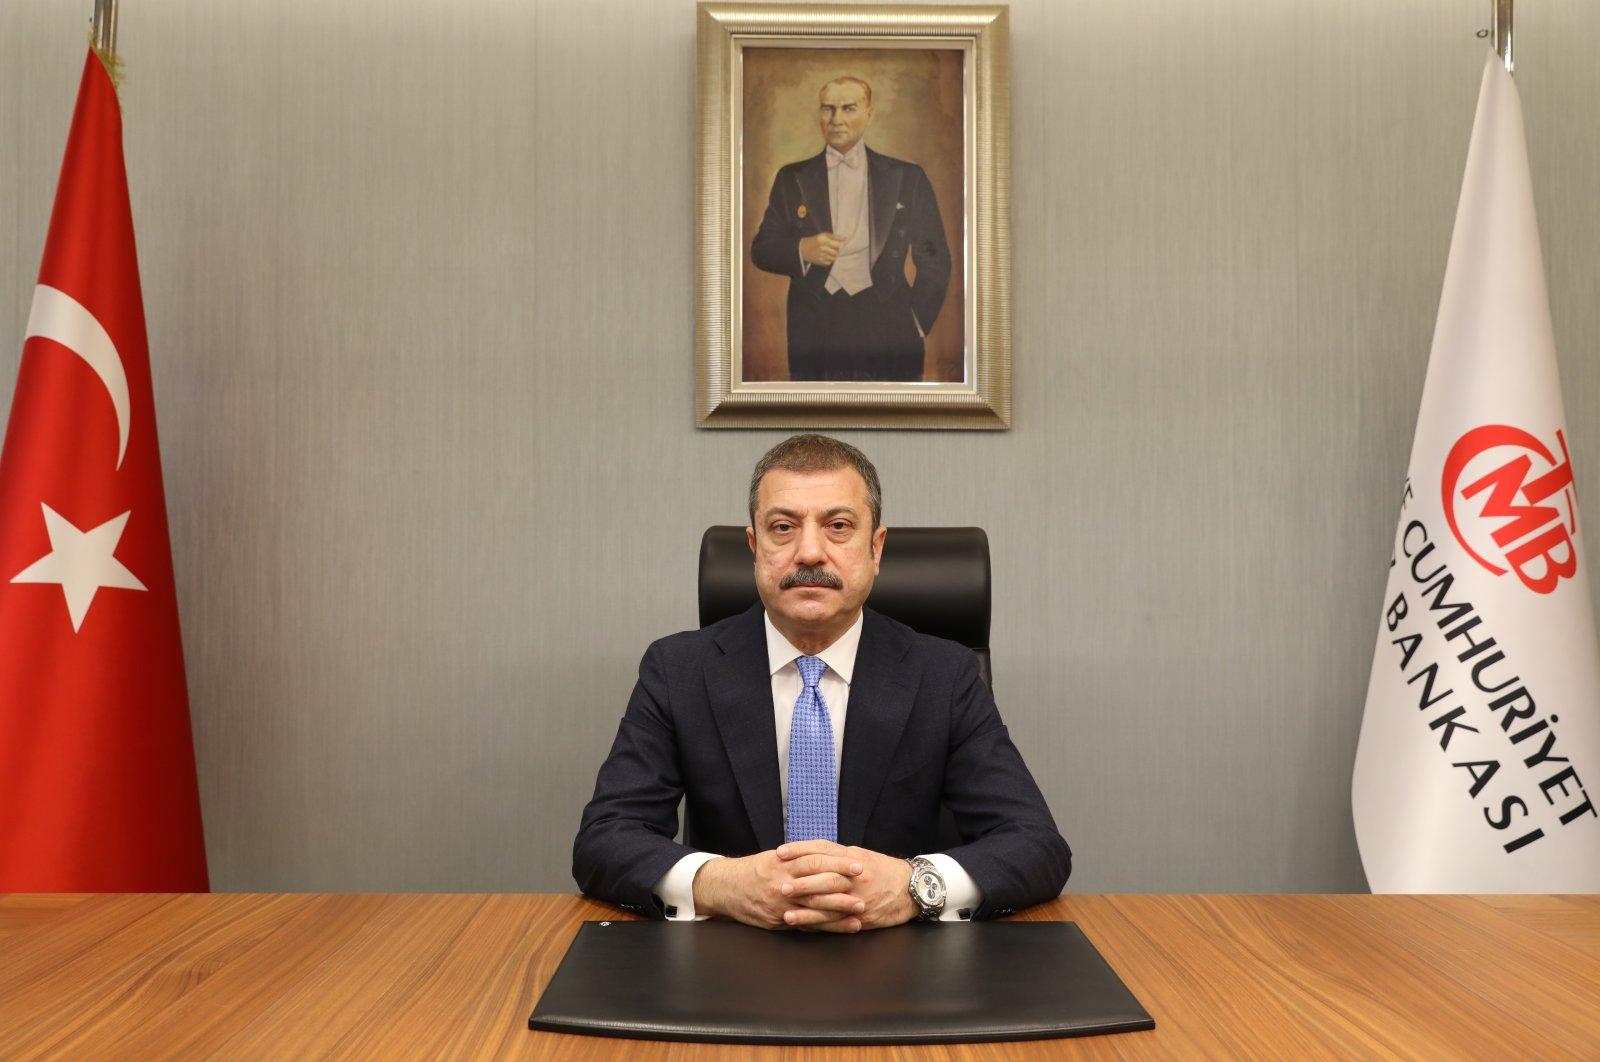 Central Bank of the Republic of Turkey (CBRT) Governor Şahap Kavcıoğlu sits in his office in the capital Ankara, Turkey March 21, 2021. (CBRT via AA)